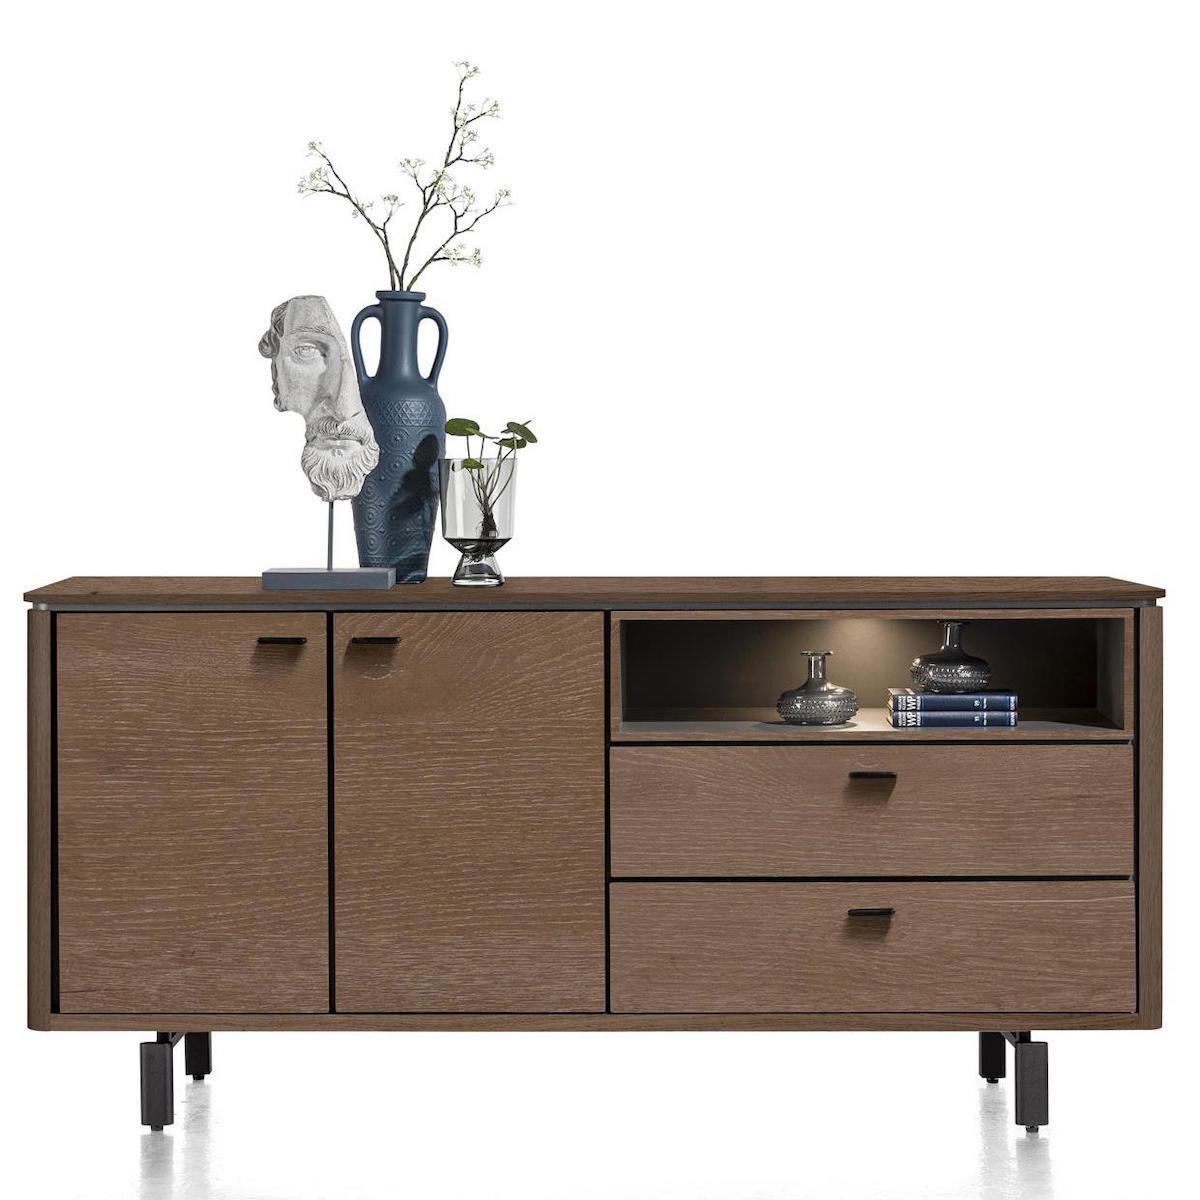 Buffet 180cm LIVADA Henders & Hazel choco brown